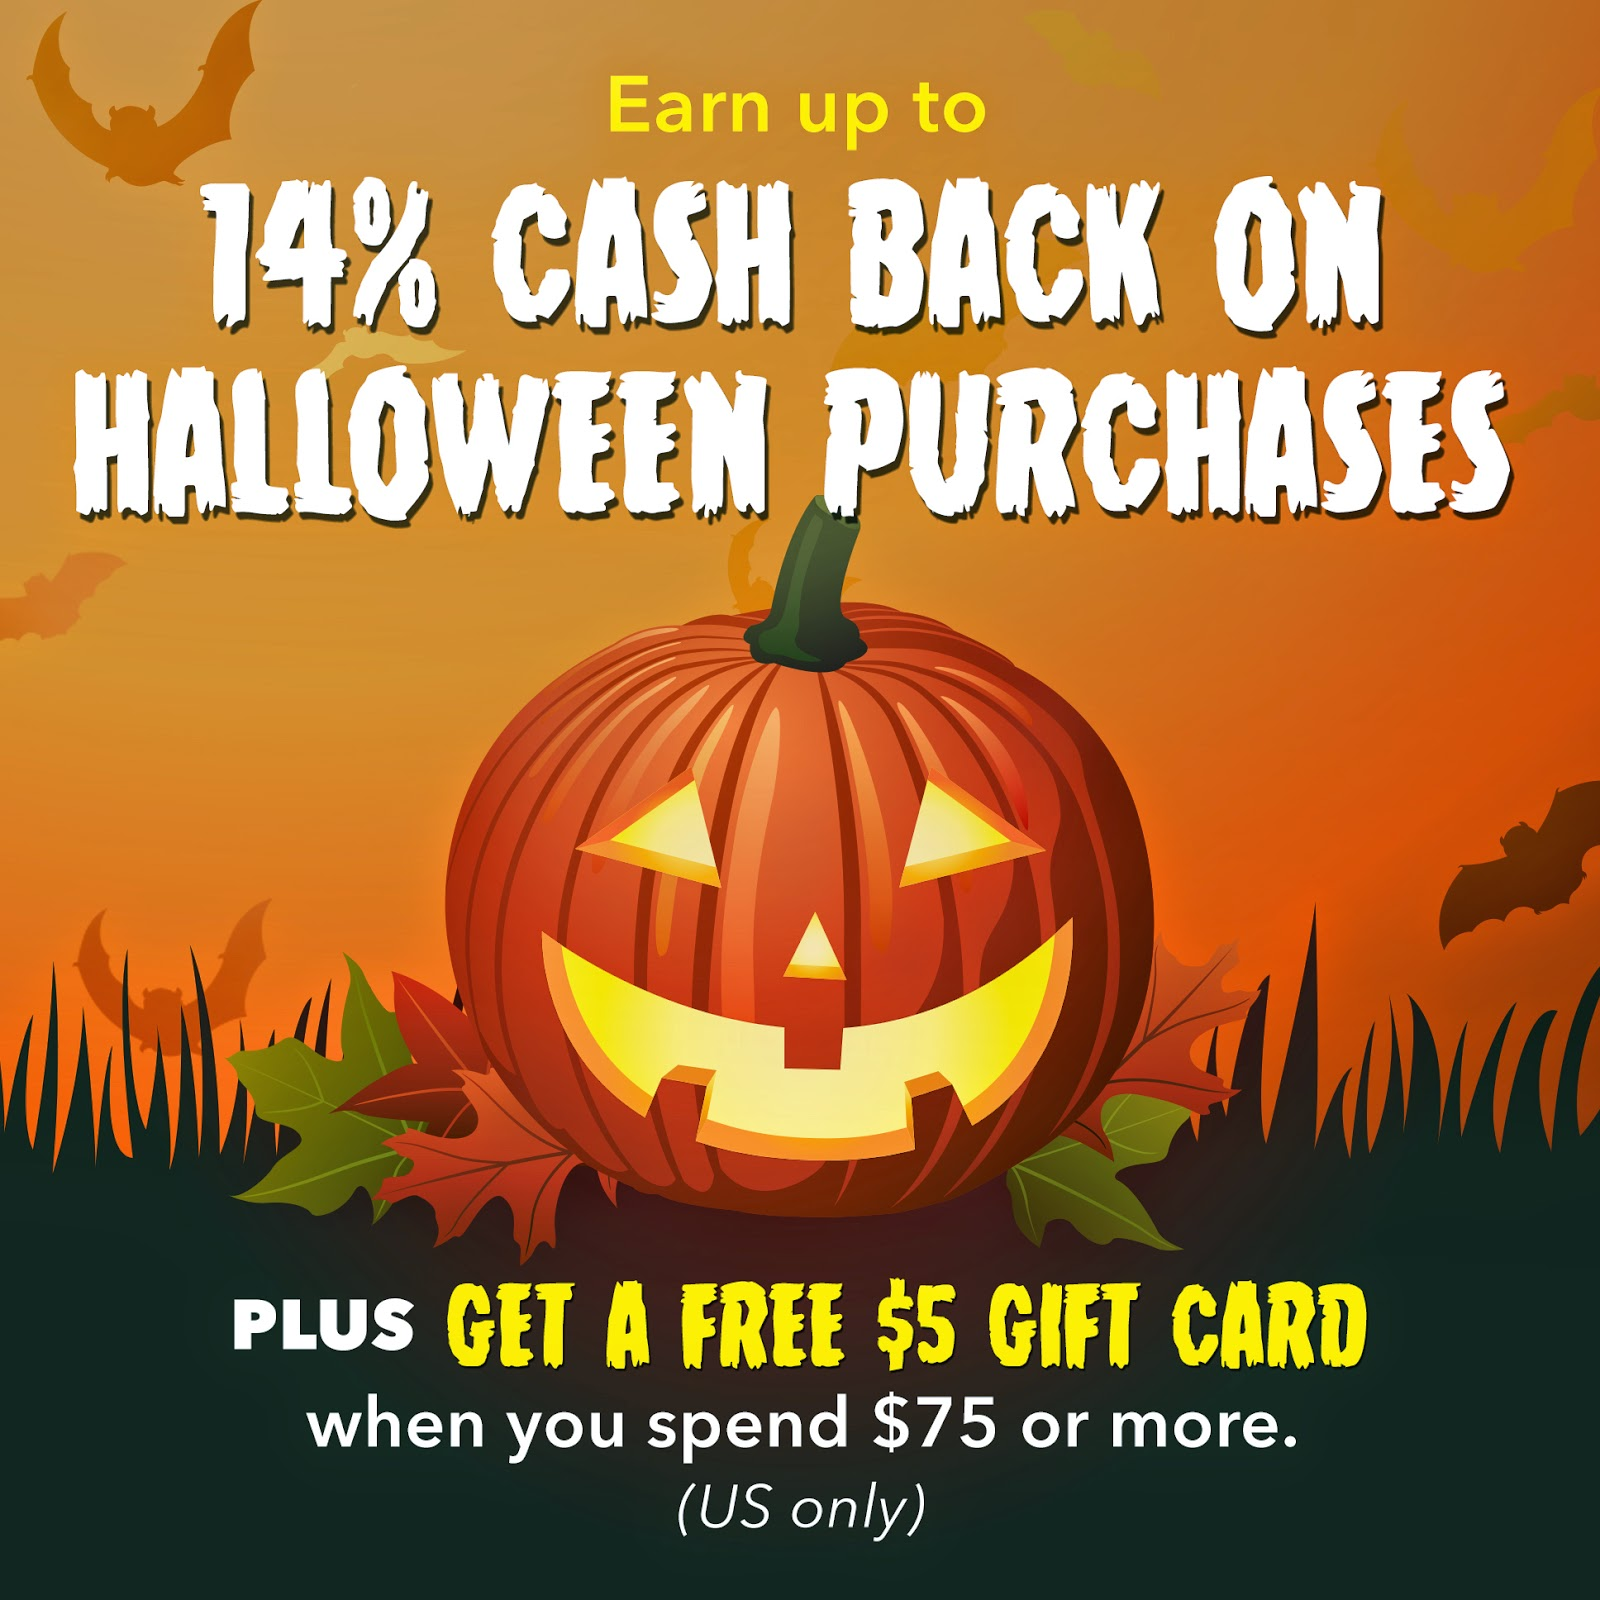 Swagbucks Halloween cash back